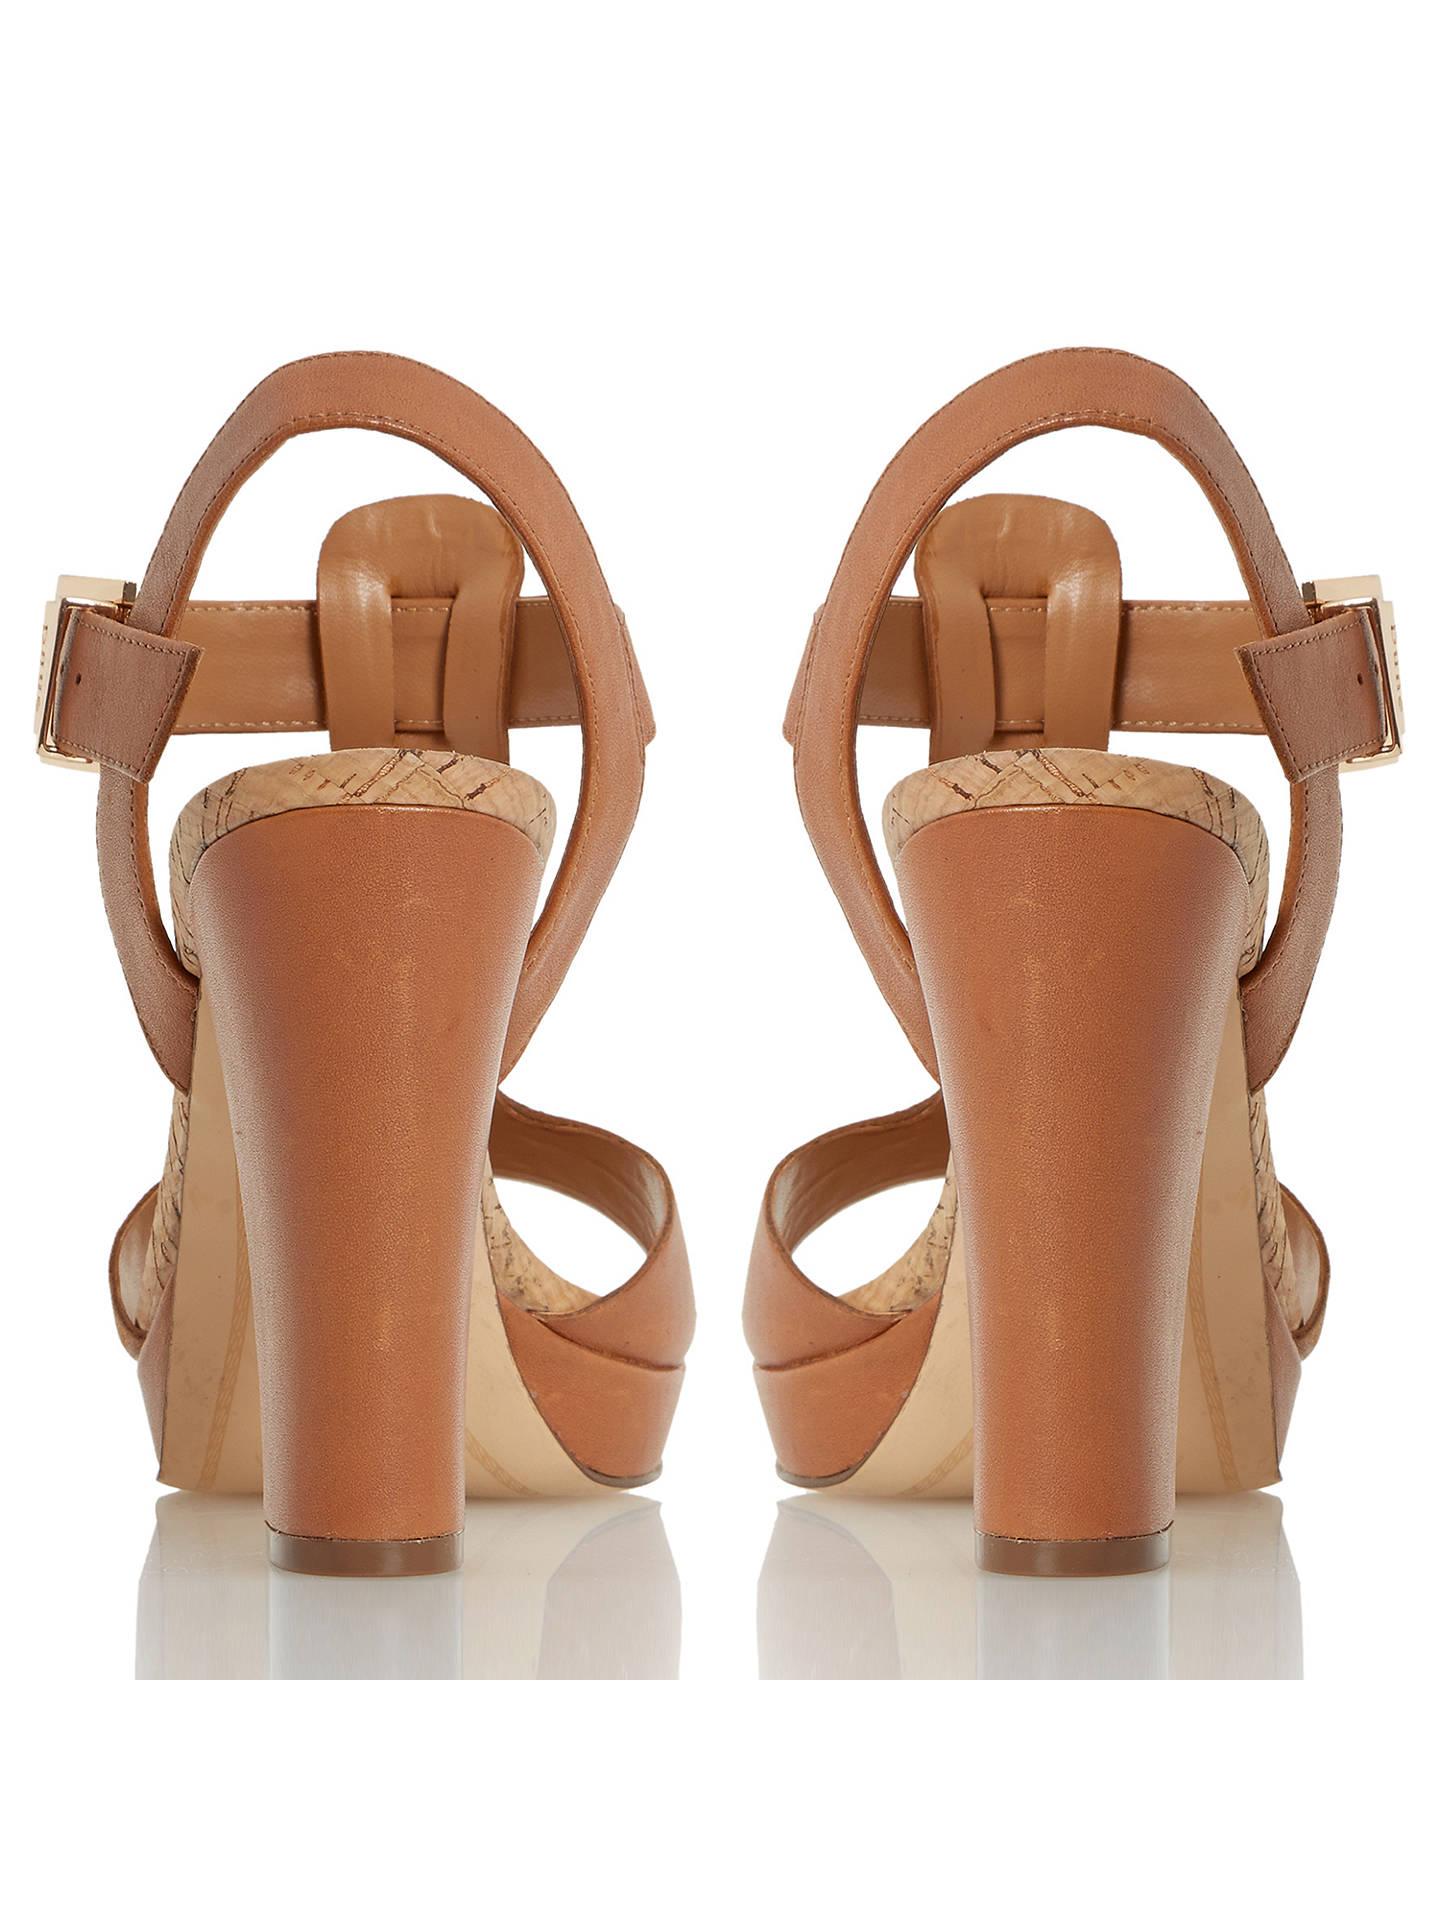 35d6b79dff7 Dune Ismin T-Bar Block Heeled Sandals, Tan Leather at John Lewis ...